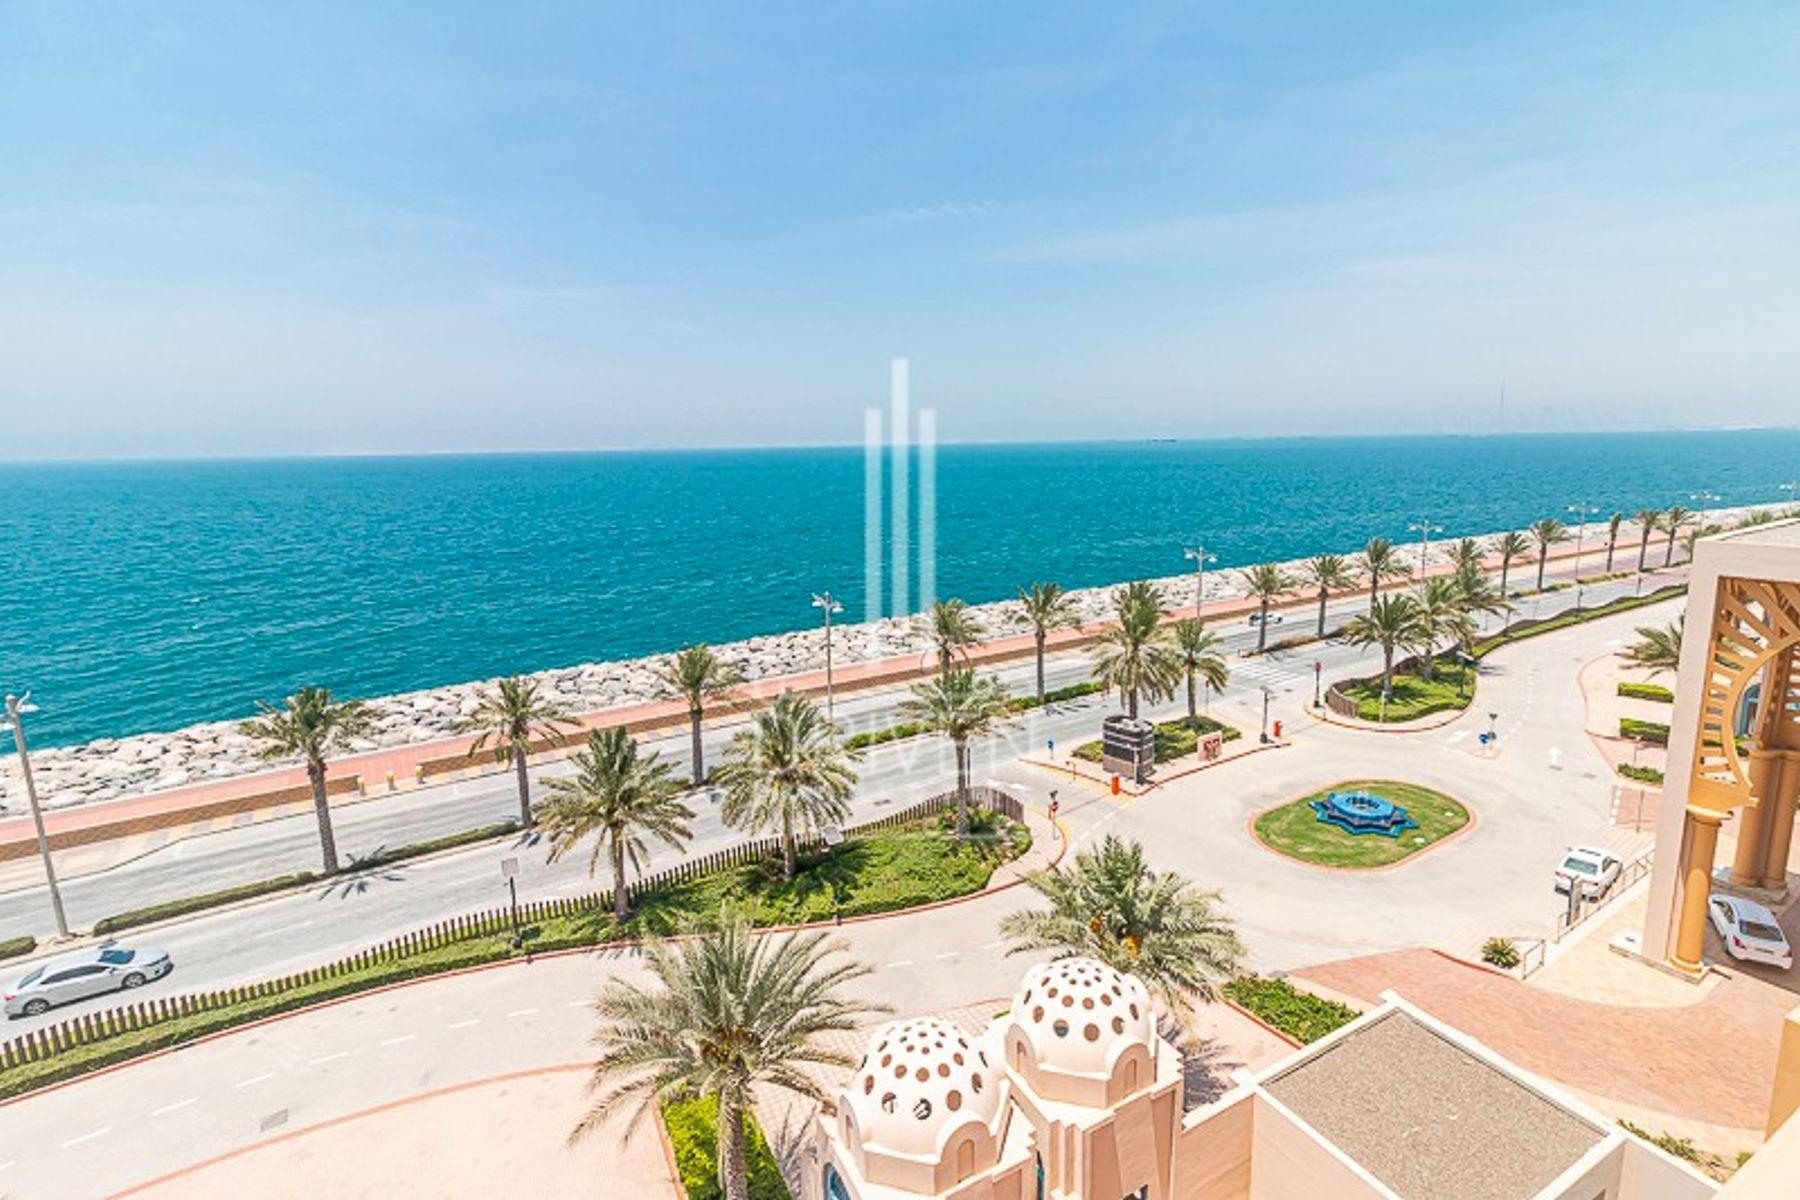 Apartment for Rent in Sarai Apartments - Palm Jumeirah